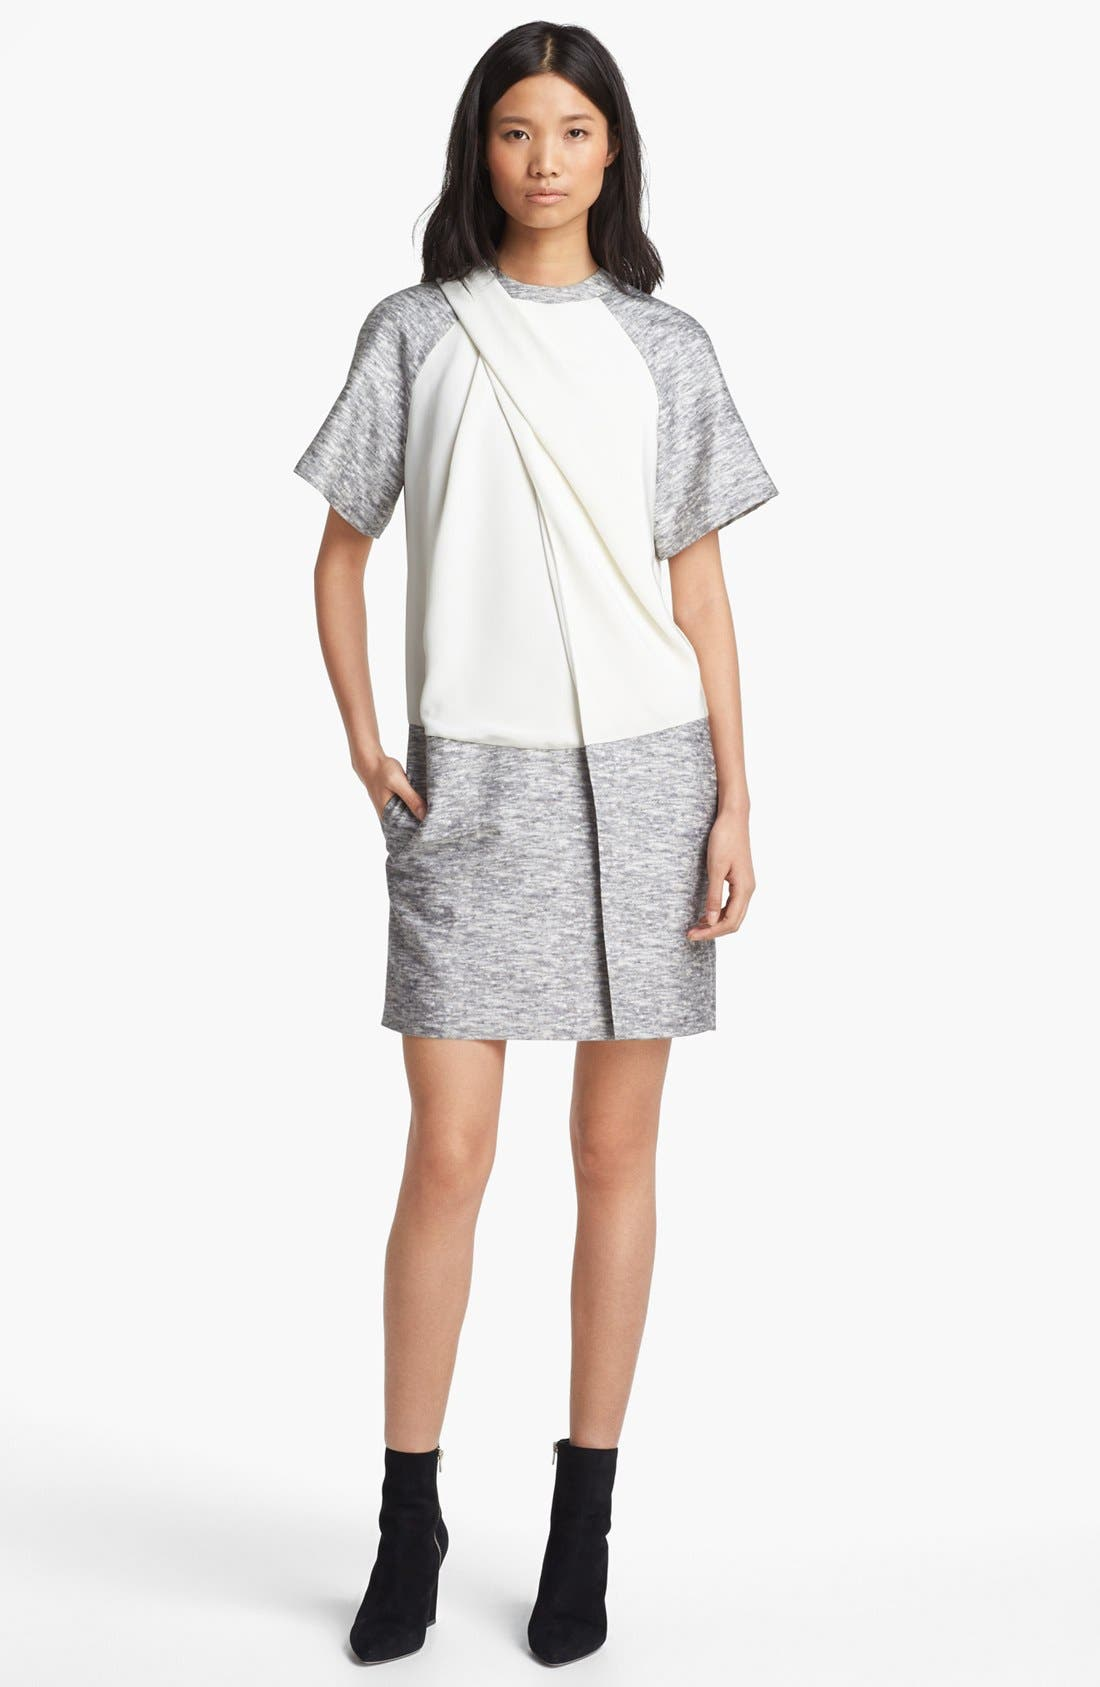 Alternate Image 1 Selected - Alexander Wang Mélange Print Wool & Silk Dress